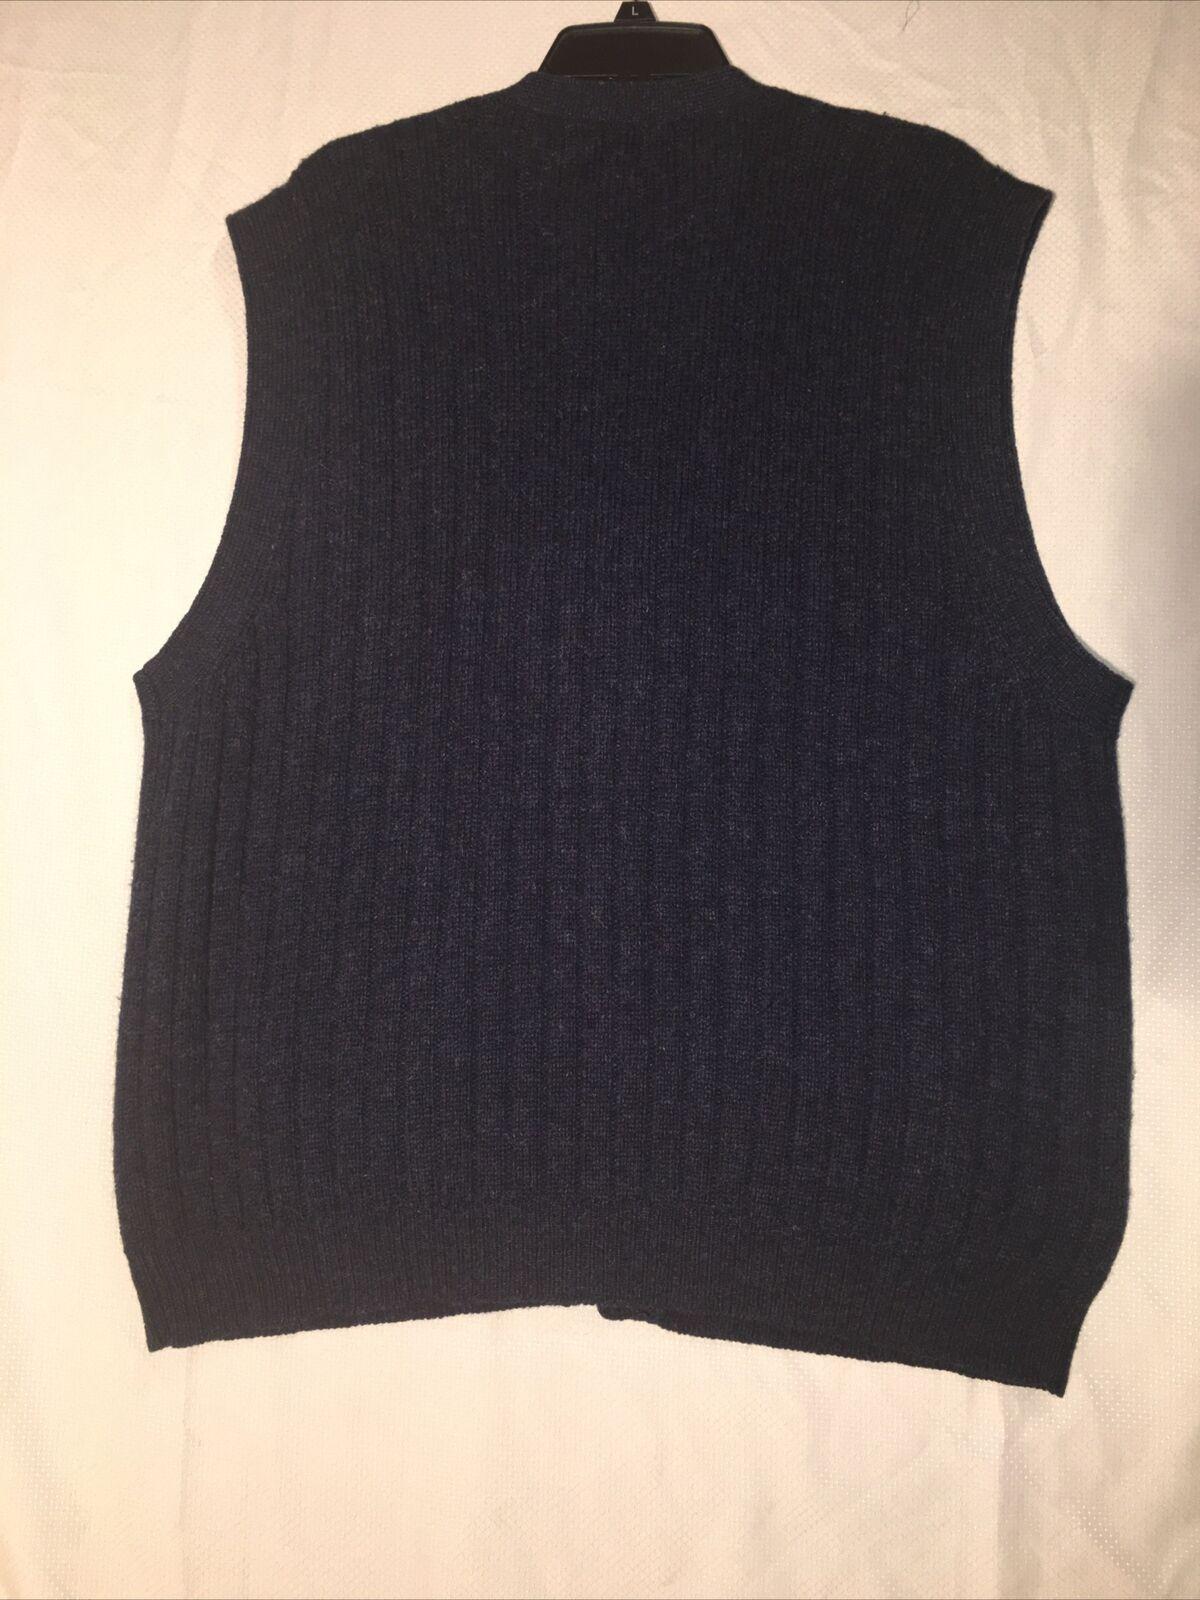 Vintage Woolrich Sweater Vest - image 2